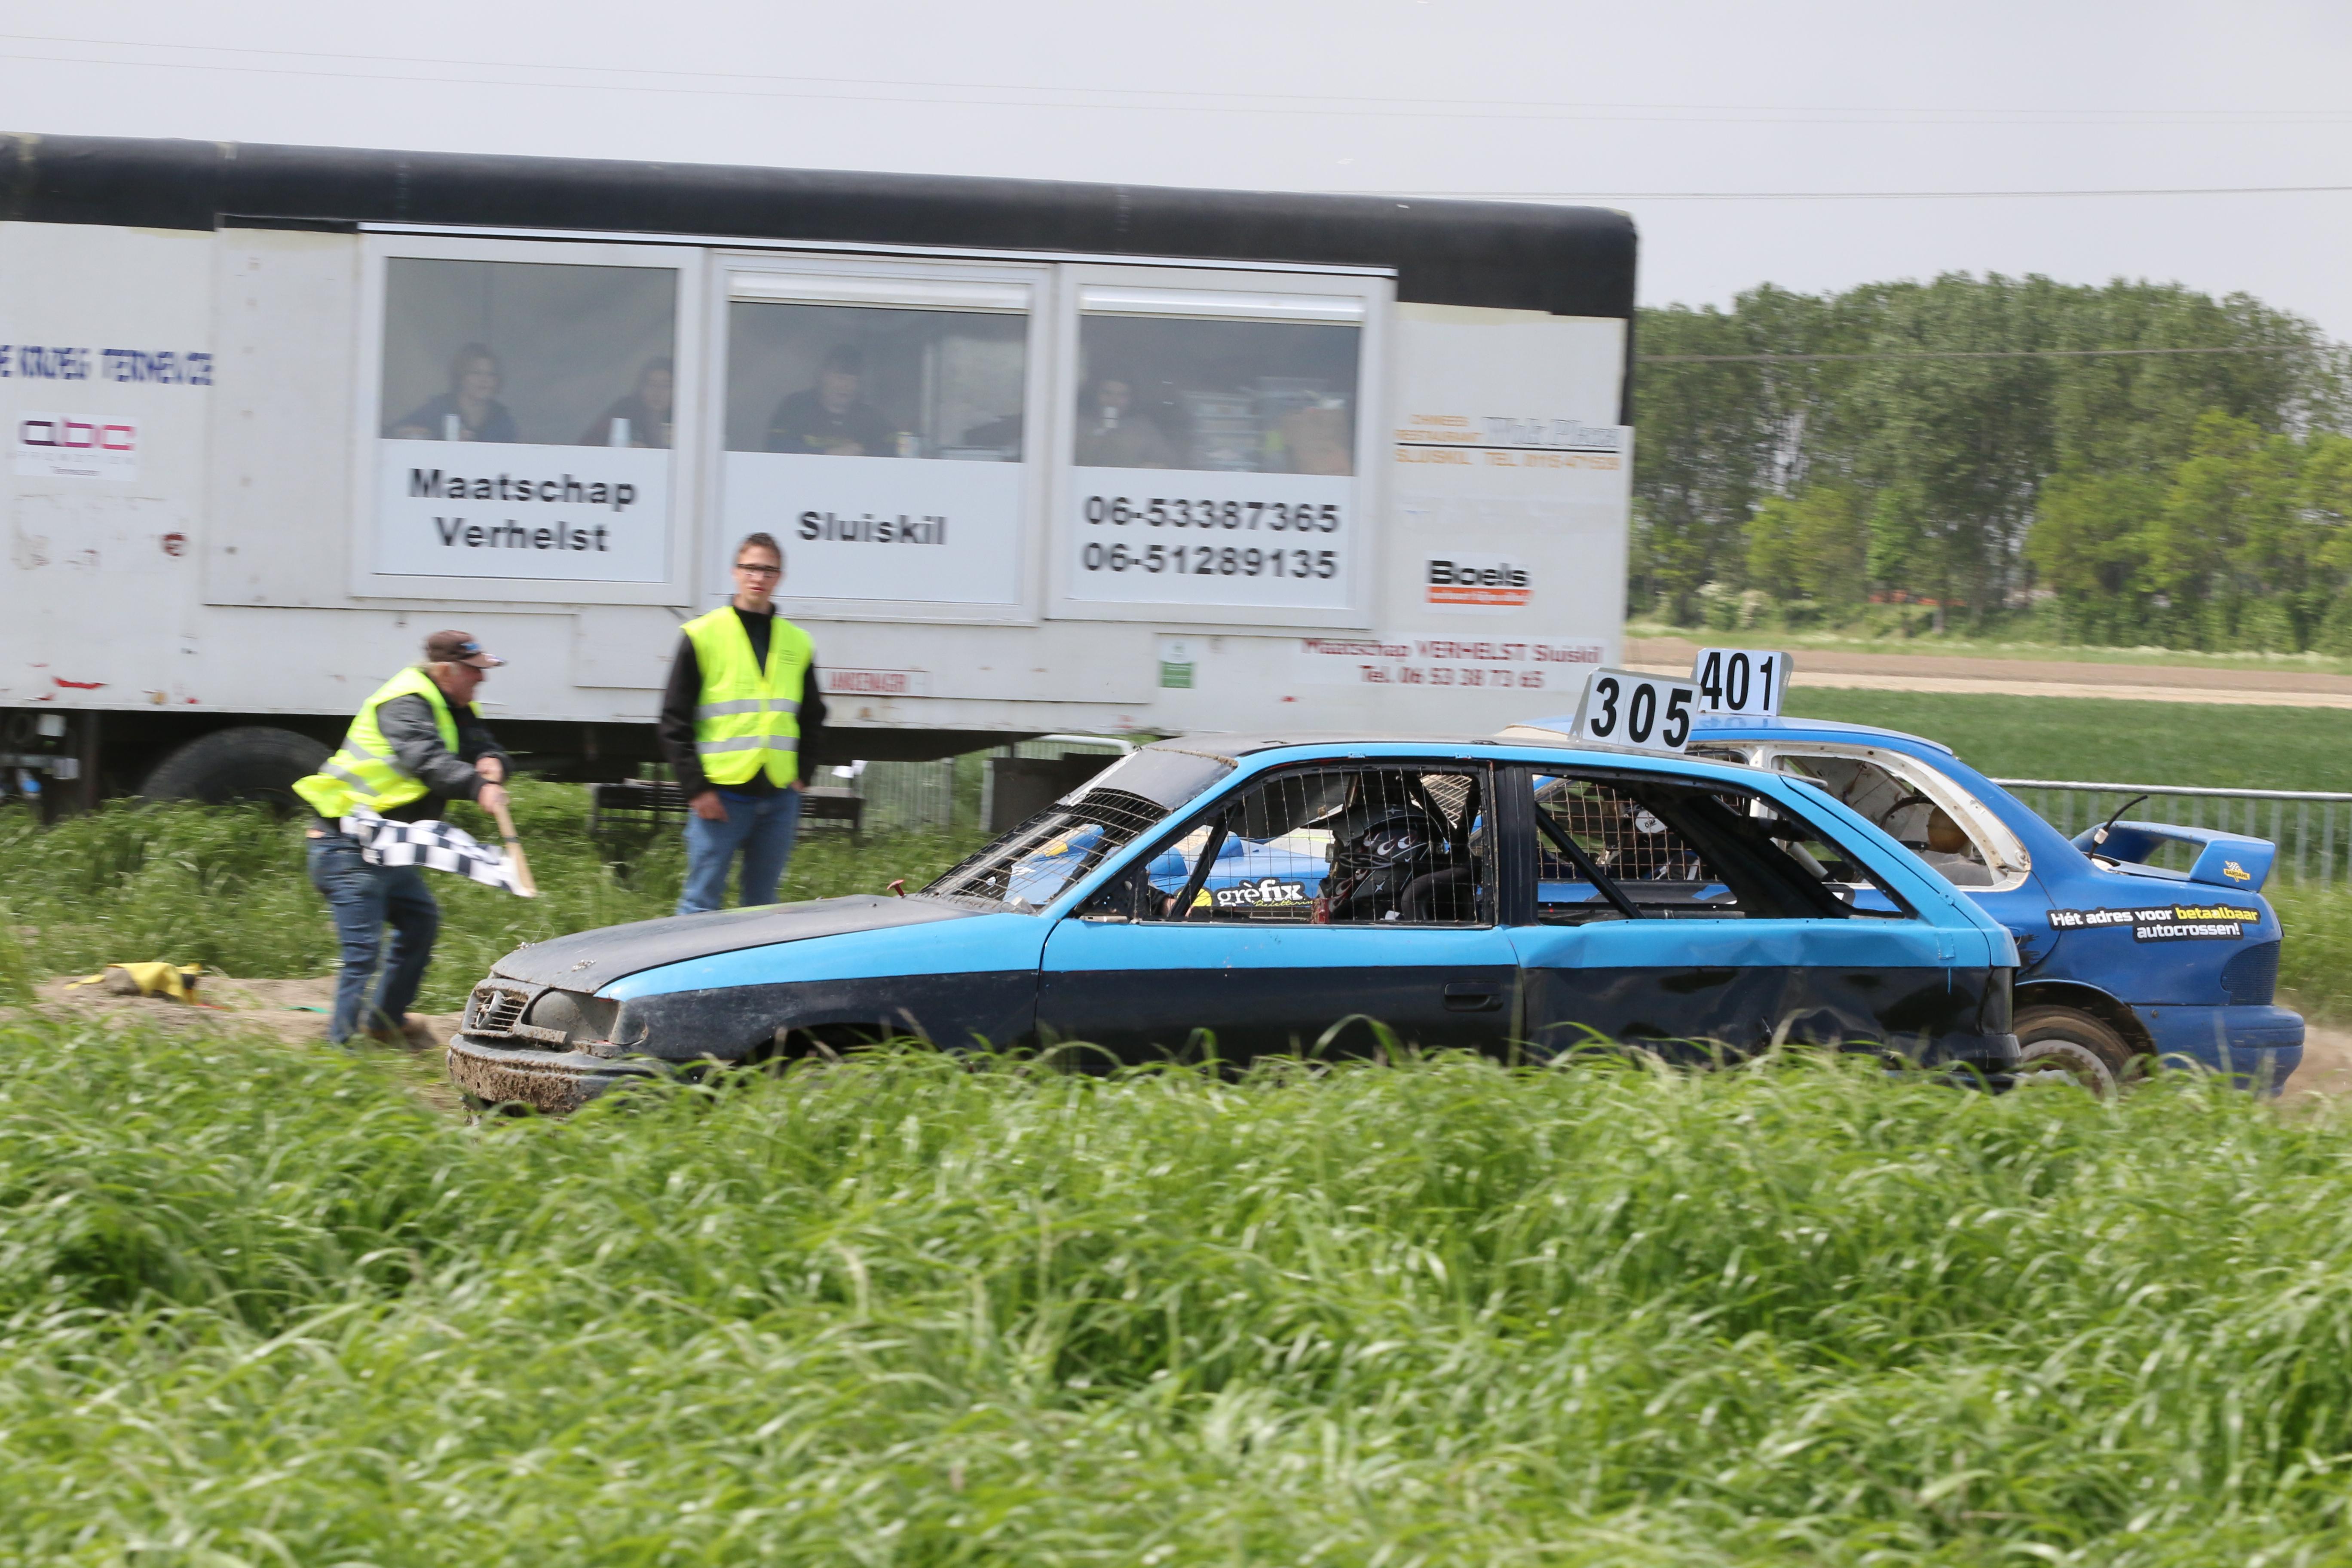 autocross sluiskil 14-5-2016 189